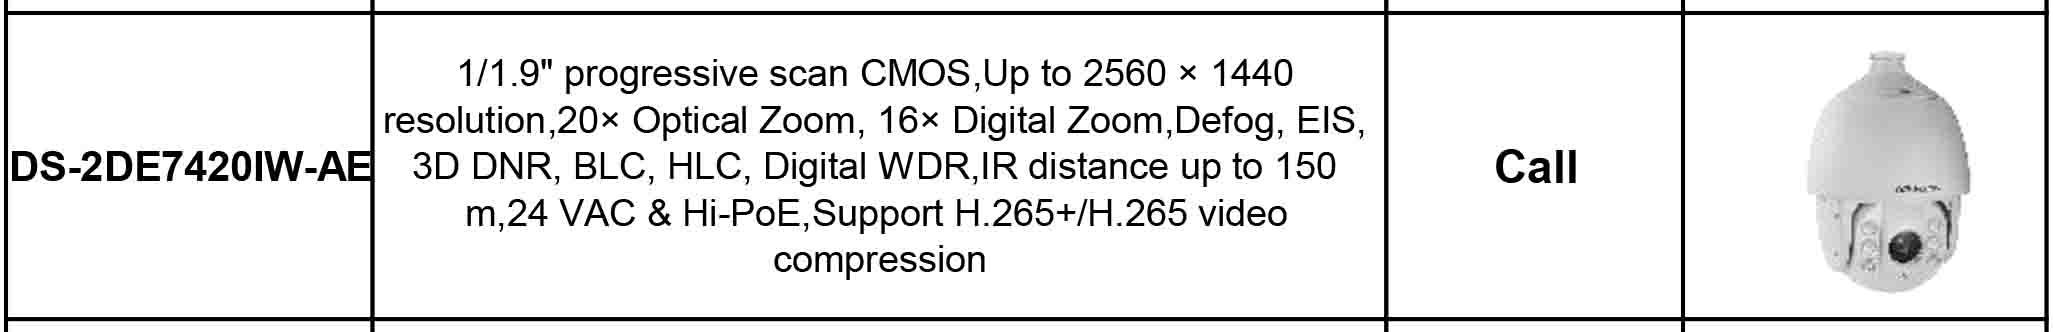 دوربین مداربسته تحت شبکه هایک ویژن مدل DS-2DE7420IW-AE